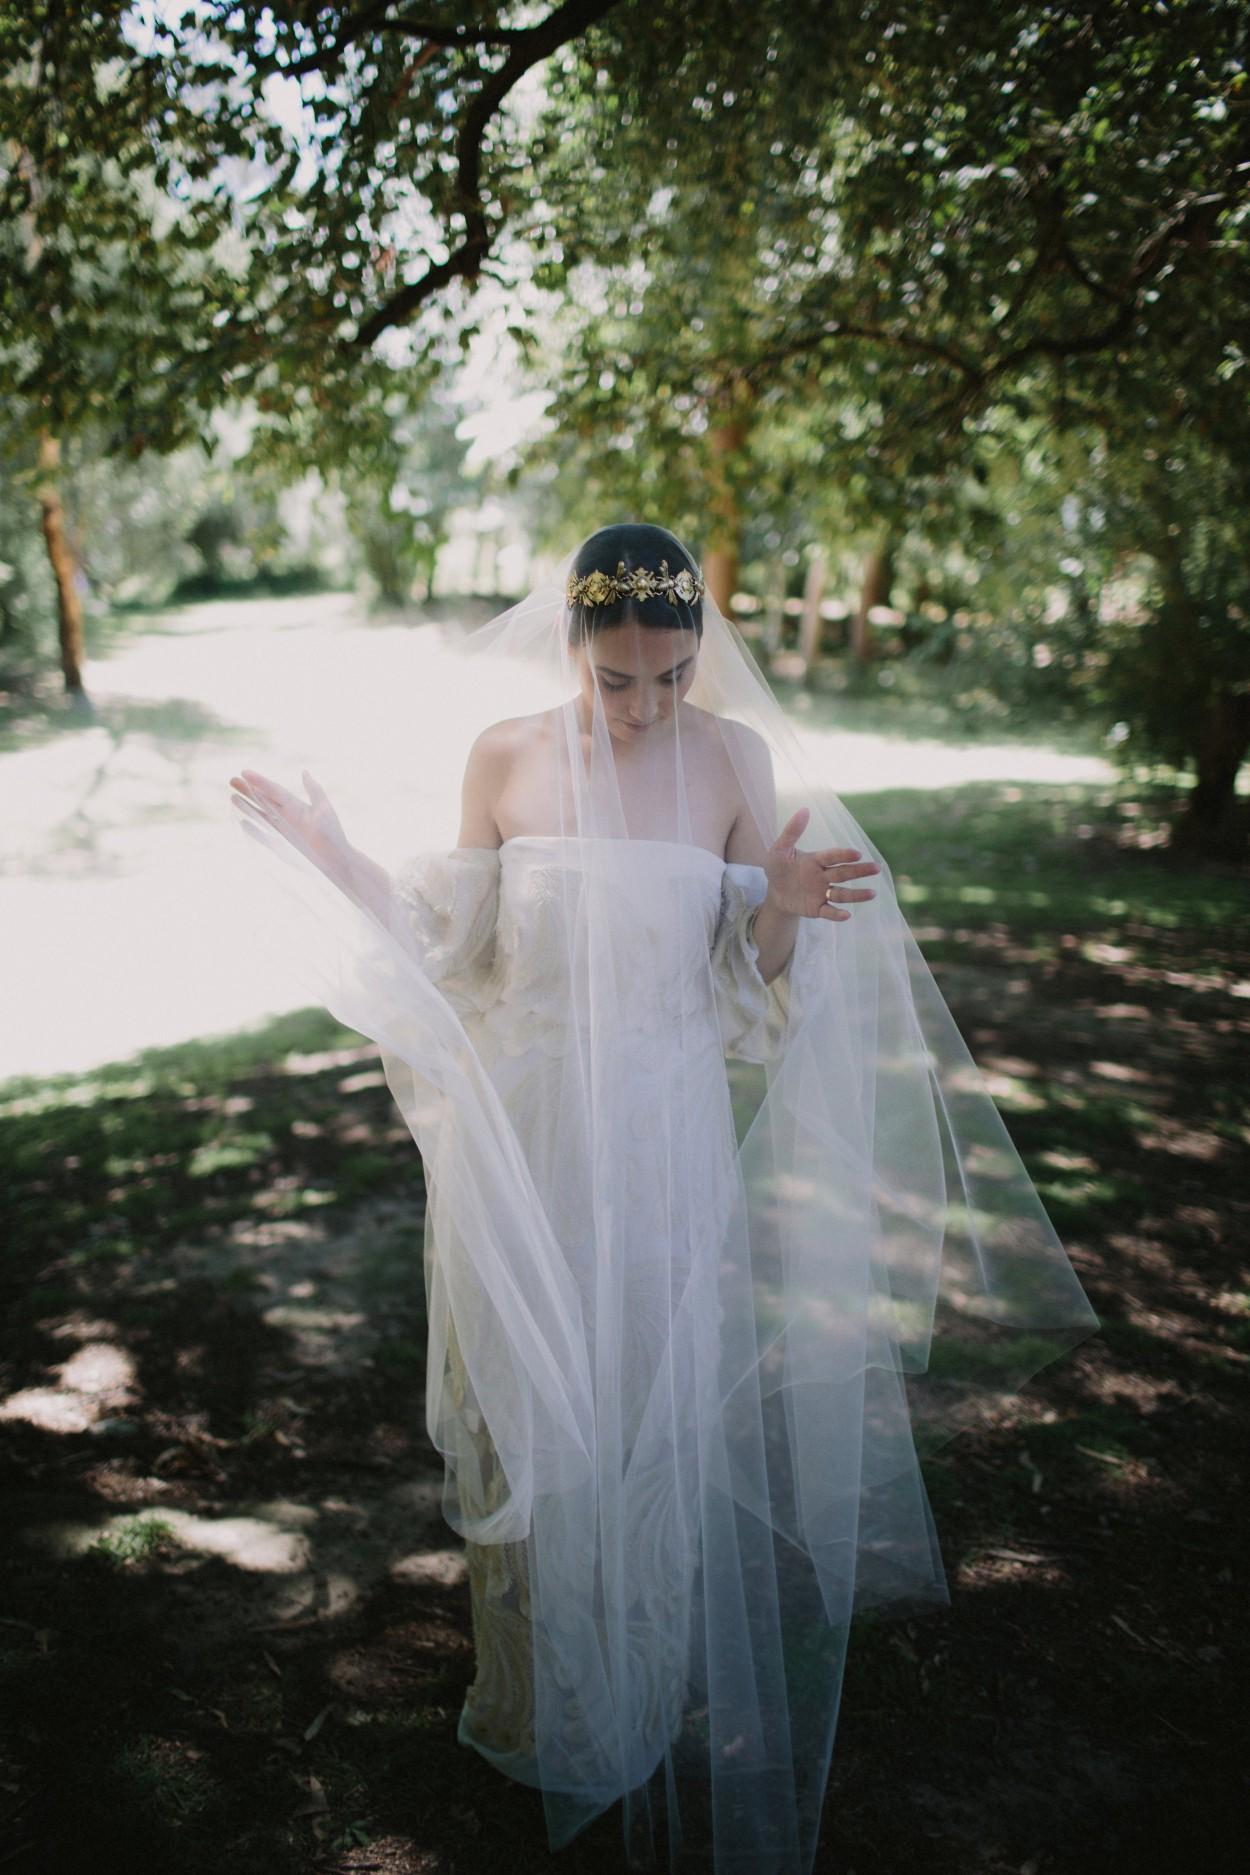 I-Got-You-Babe-Weddings-Heide-Museum-of-Modern-Art-Elopement-Susie-Nathan037.jpg